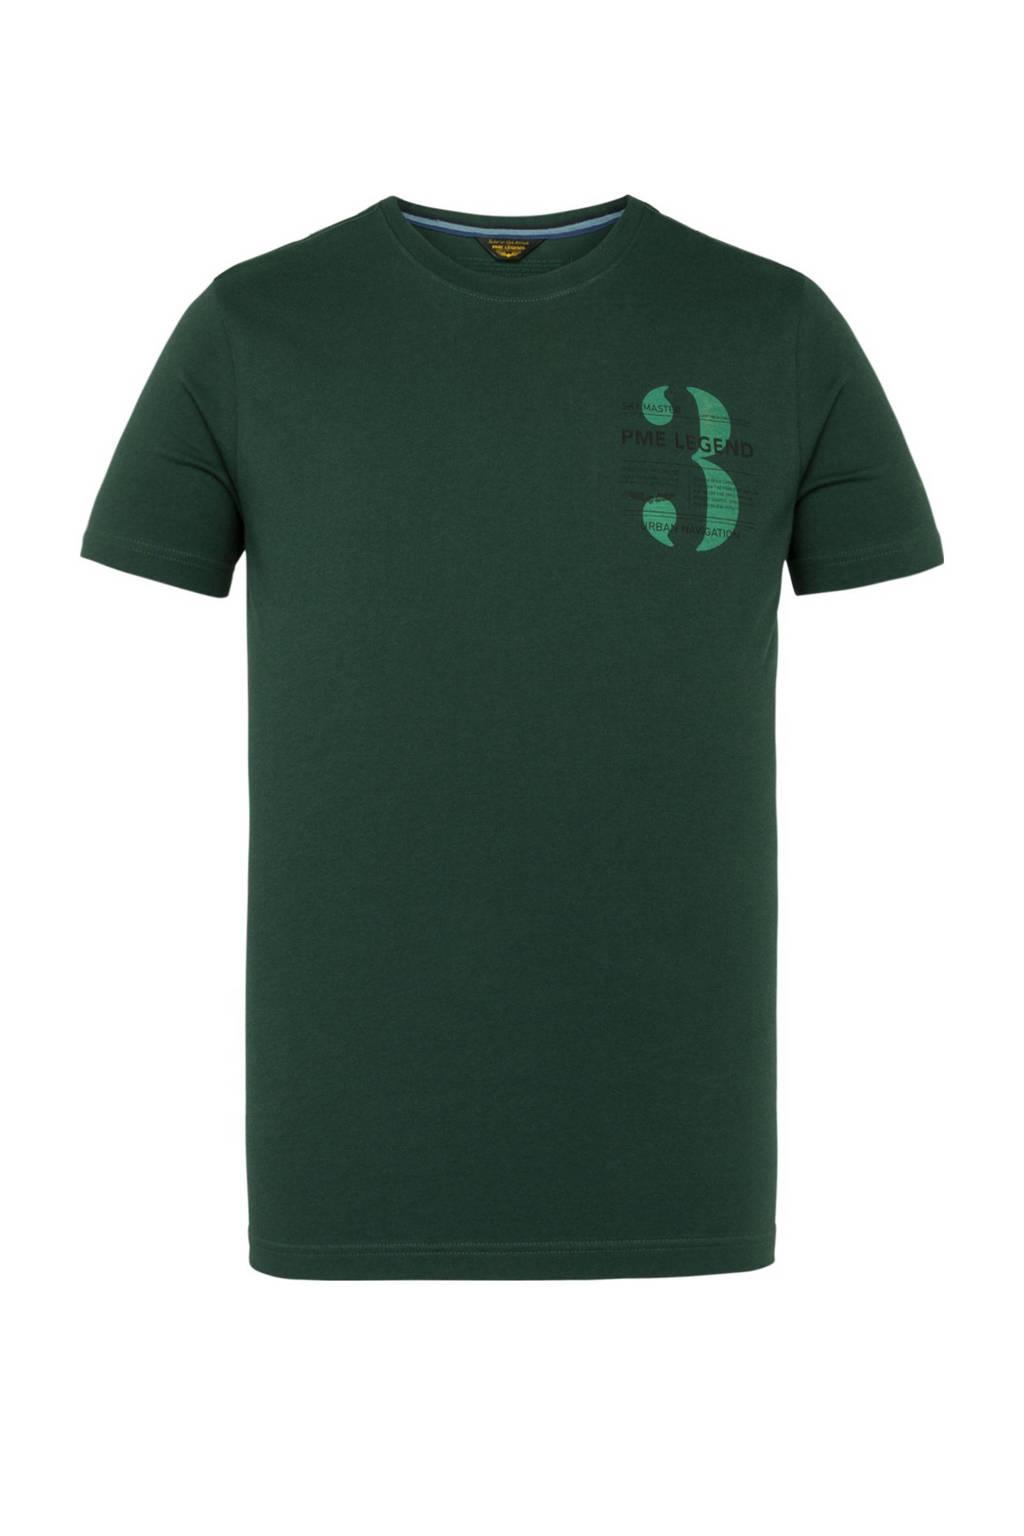 PME Legend T-shirt met logo donkergroen, Donkergroen